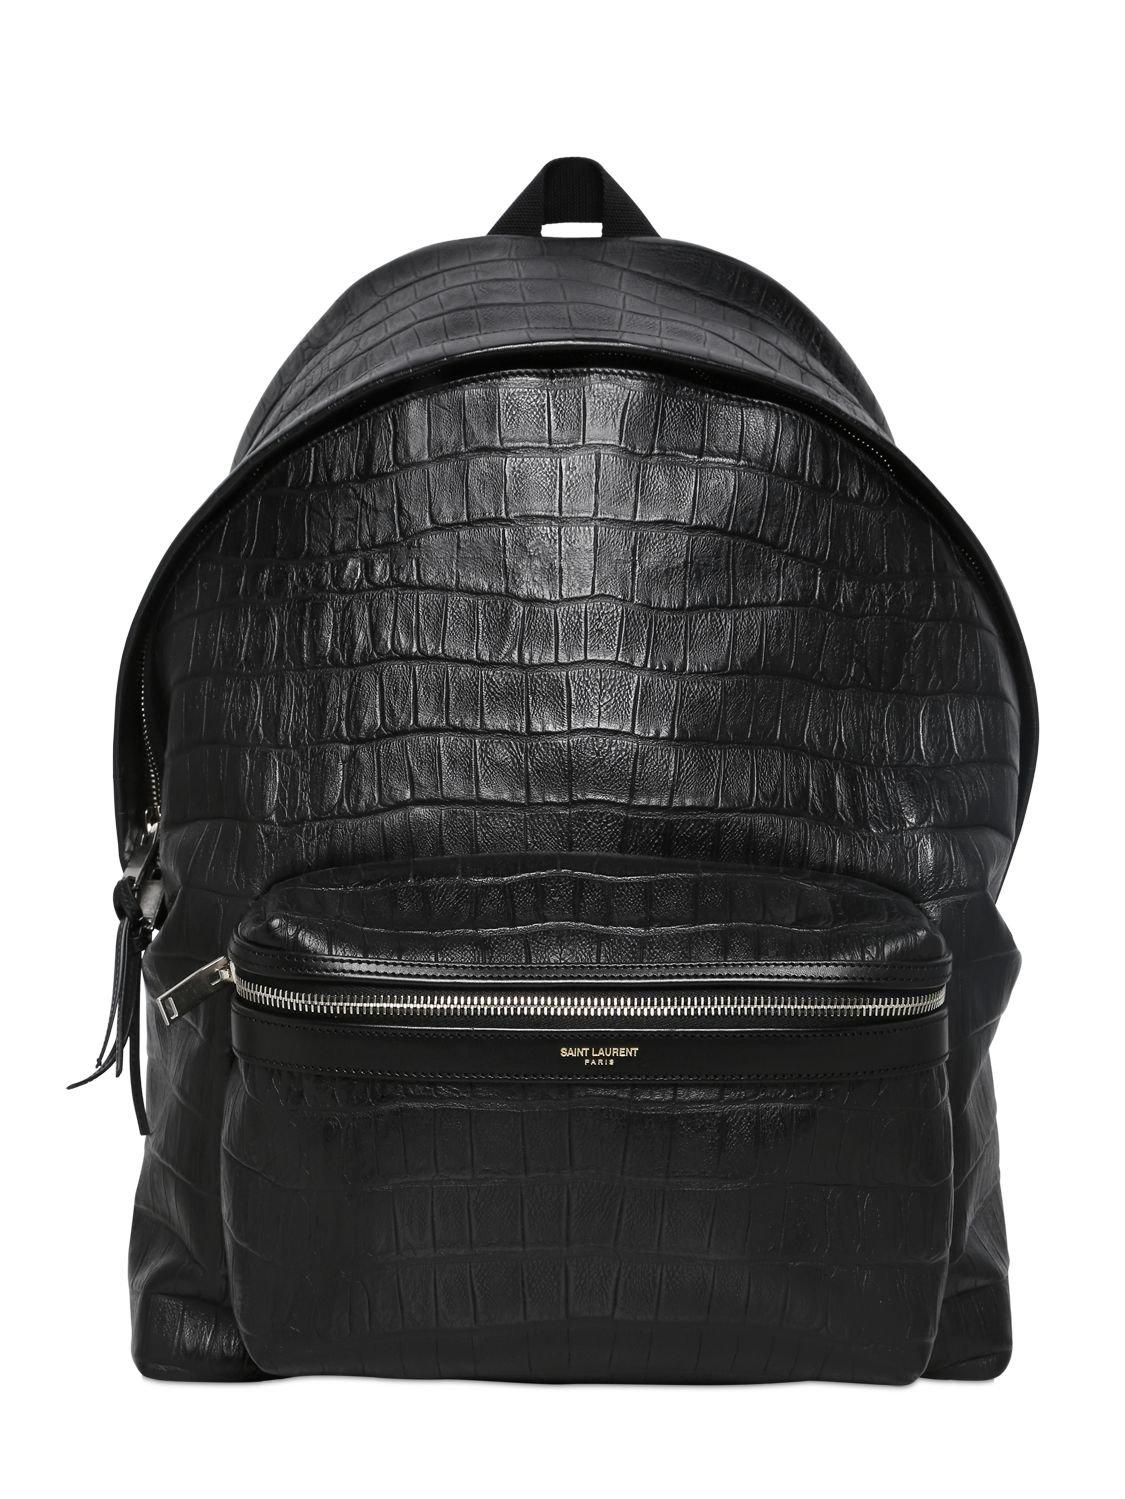 Saint laurent Croc Embossed Leather Backpack in Black for Men | Lyst